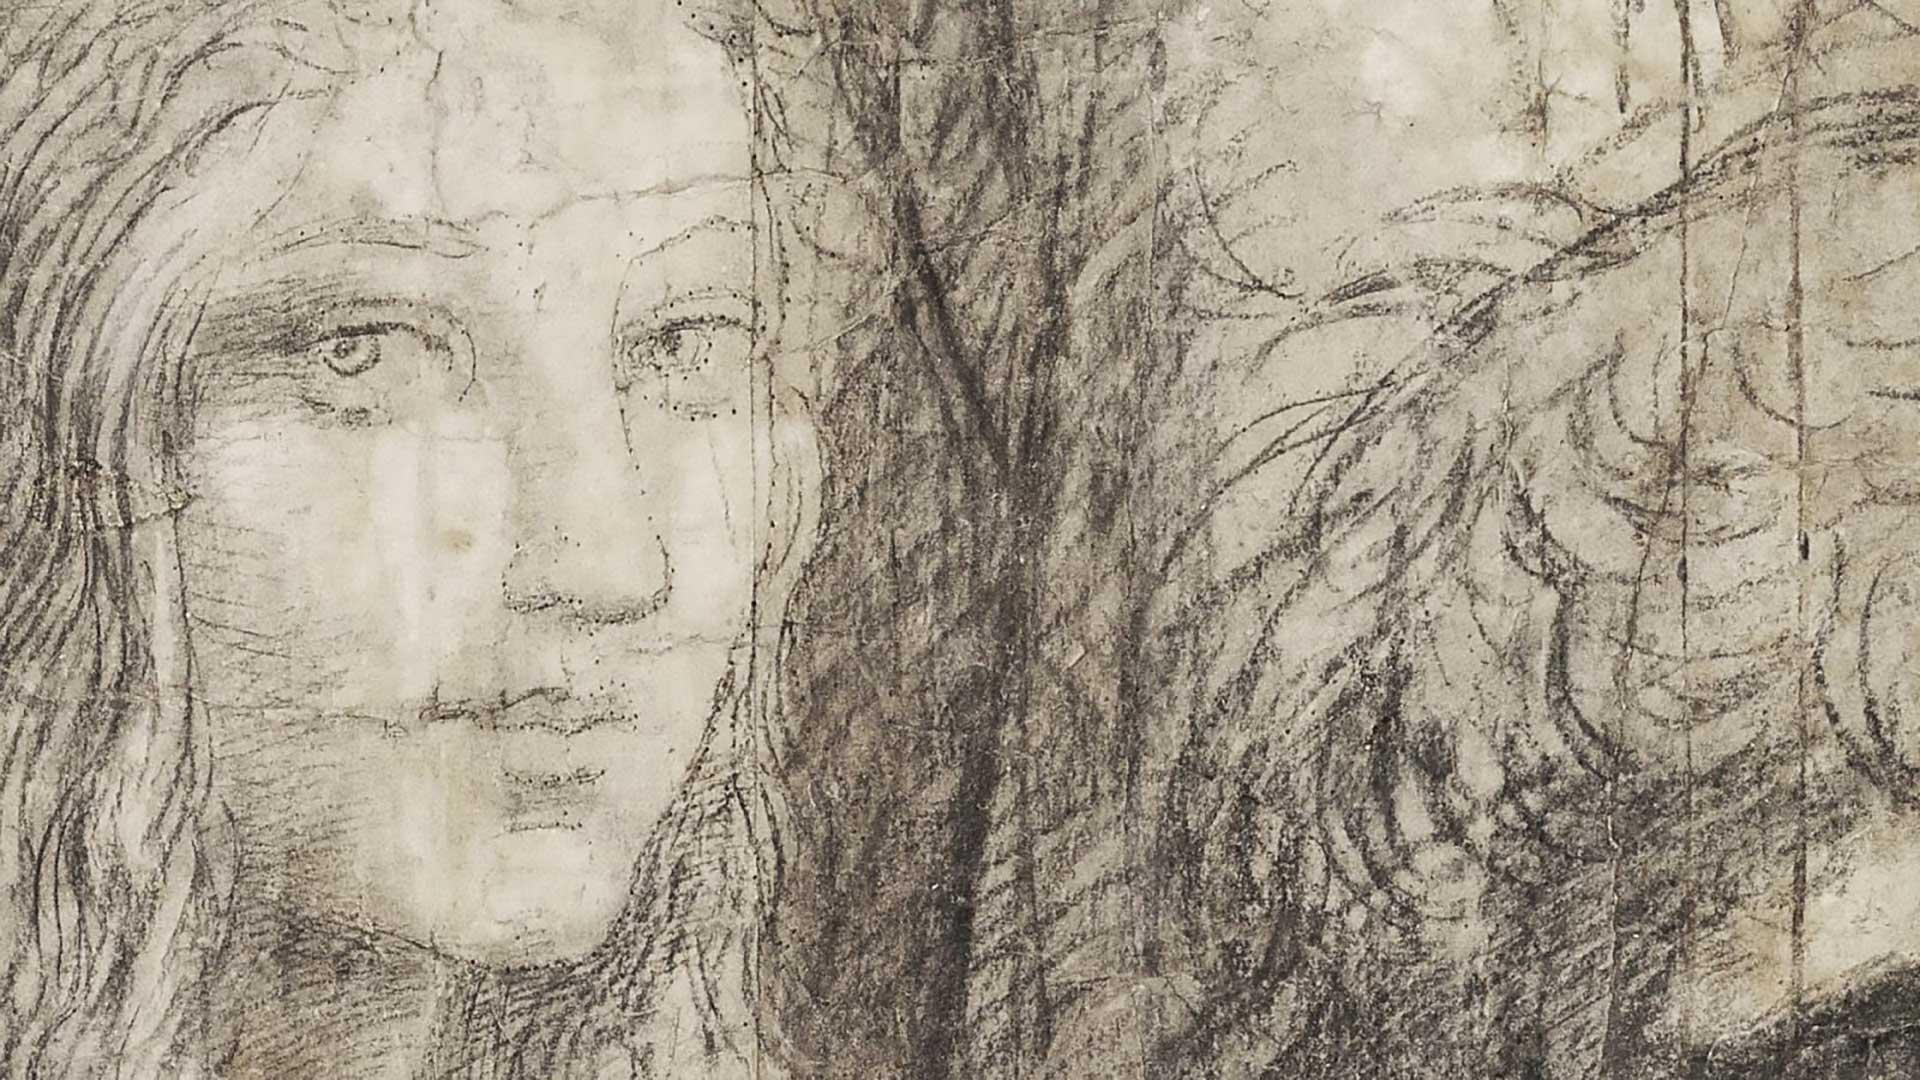 <p><em>The School of Athens</em>, Raphael (1483-1520), 1510, preparatory cartoon, charcoal and white lead, 285 × 804 cm (detail)</p>